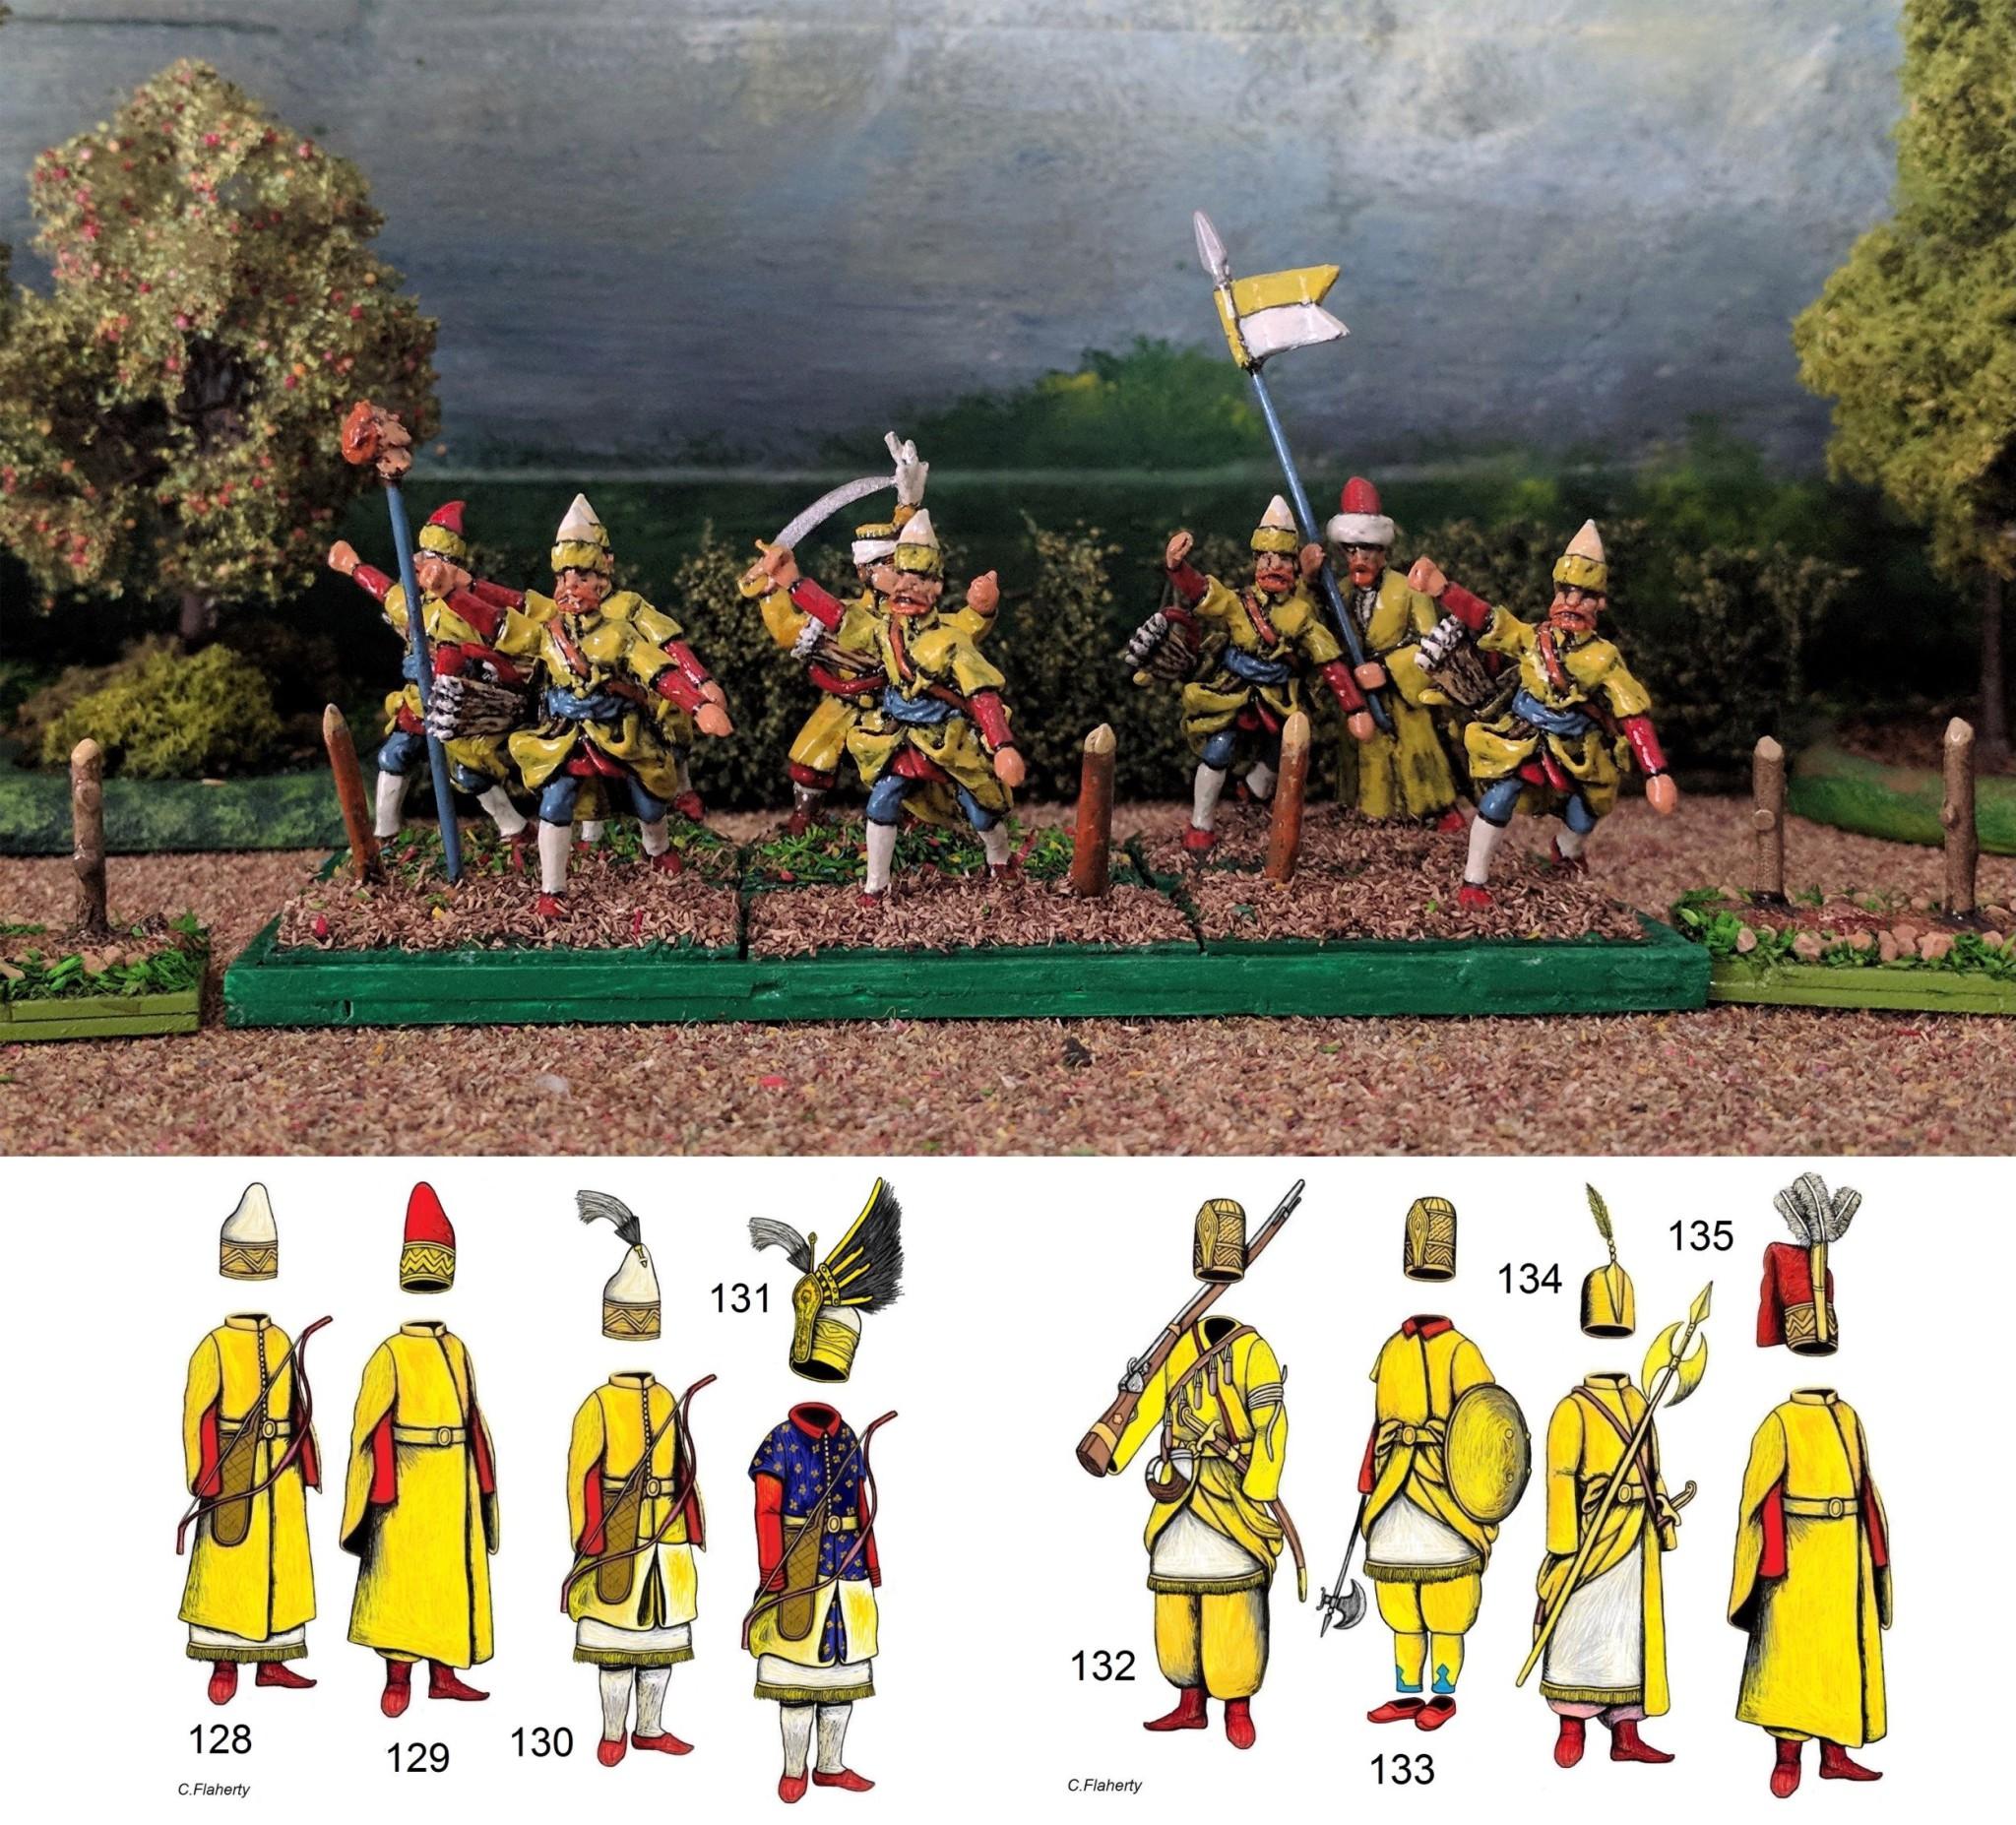 THE NAPOLEONIC OTTOMAN ARMY